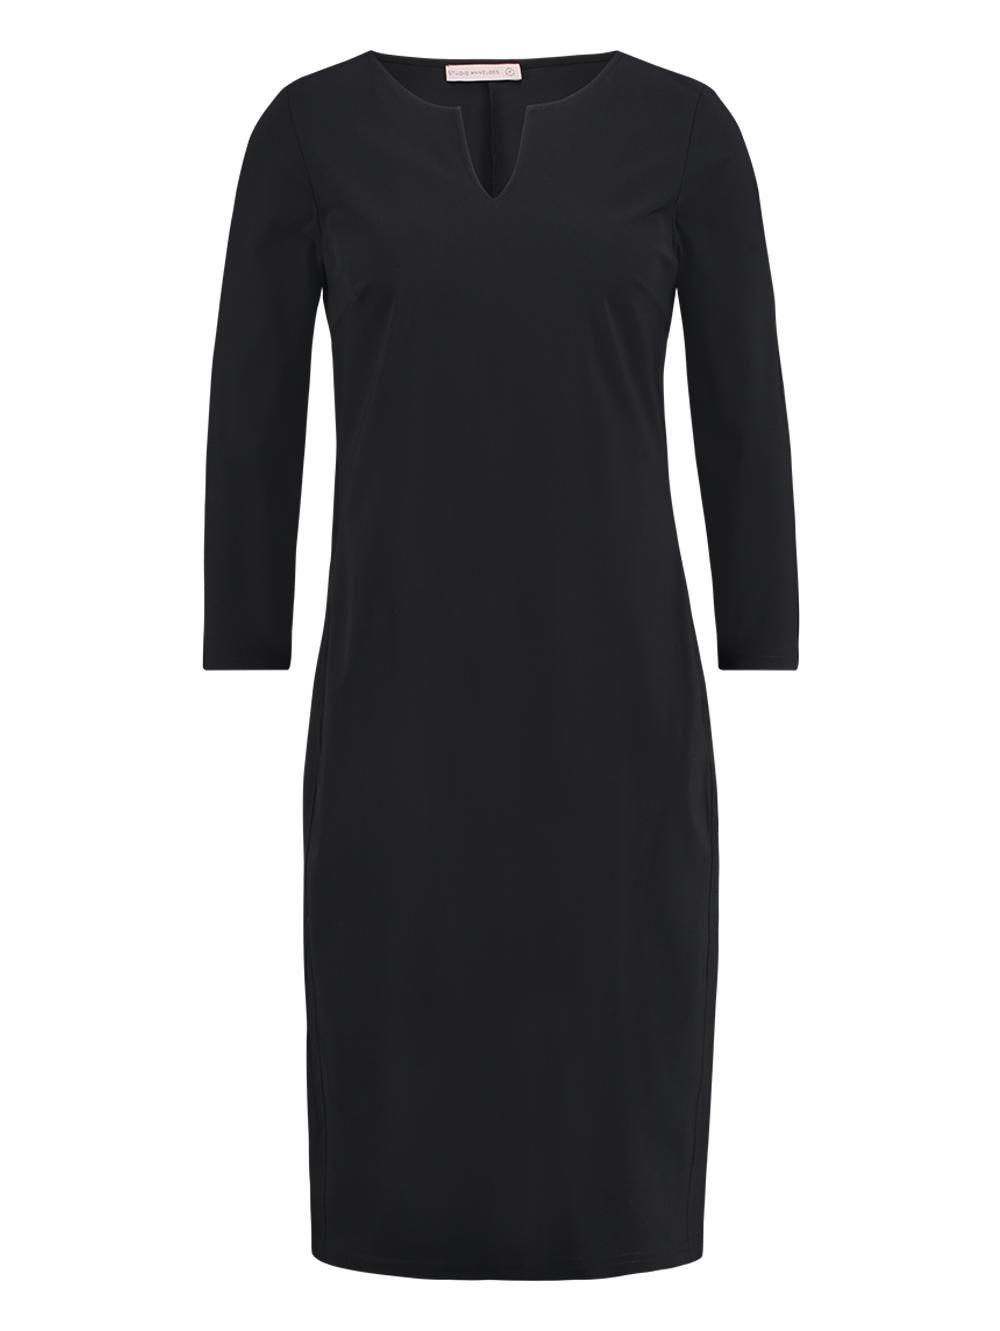 Simplicity dress